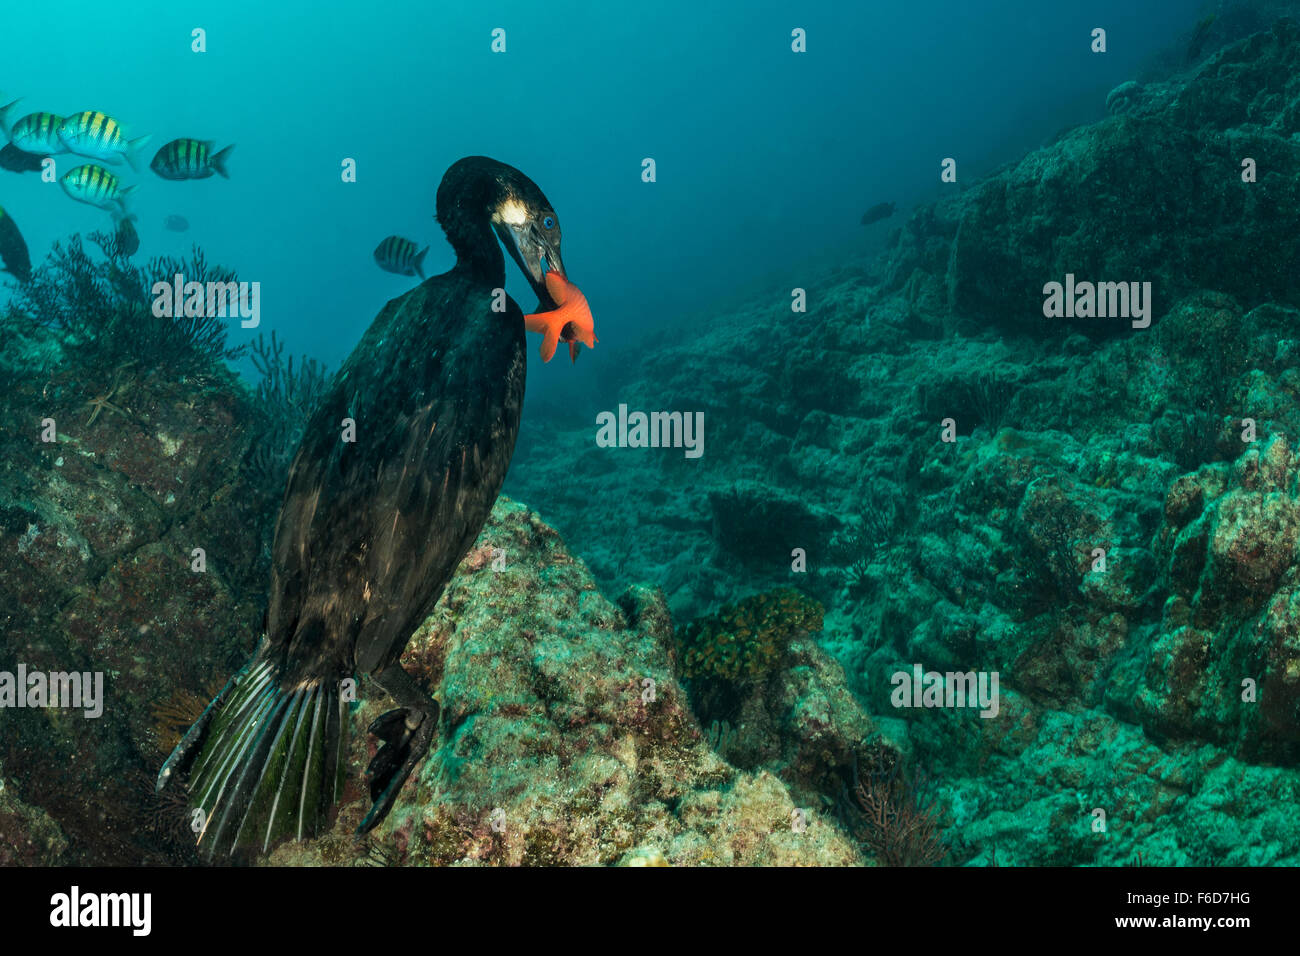 Brandts Cormorant captured Fish, Phalacrocorax penicillatus, La Paz, Baja California Sur, Mexico - Stock Image